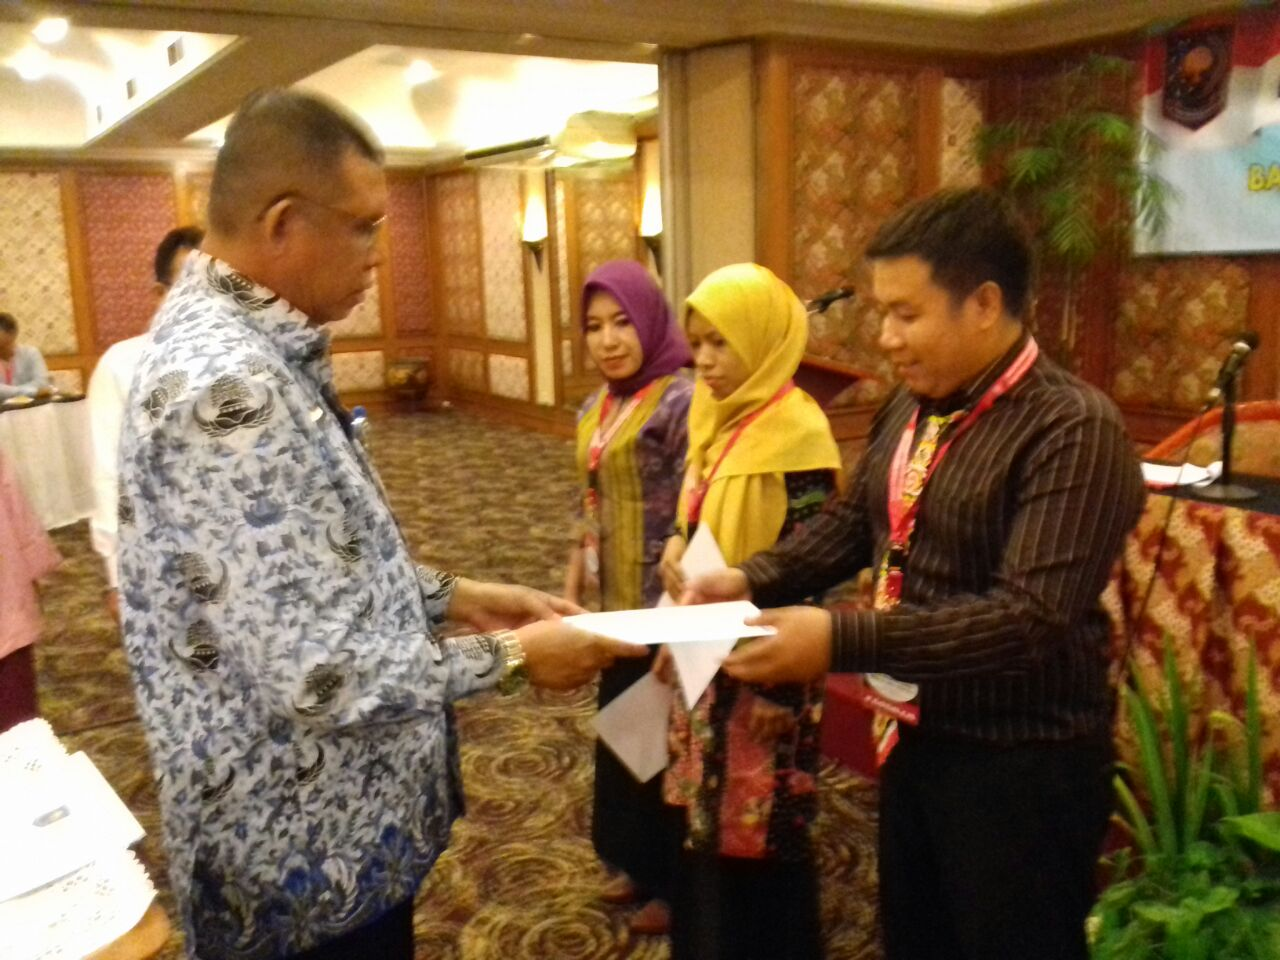 ASN BAPPEDA Kabupaten Sanggau Mengikuti Diklat Penyusunan RENSTRA Perangkat Daerah Angkatan III Tahun 2017 Yang Diadakan BPSDM Kemendagri